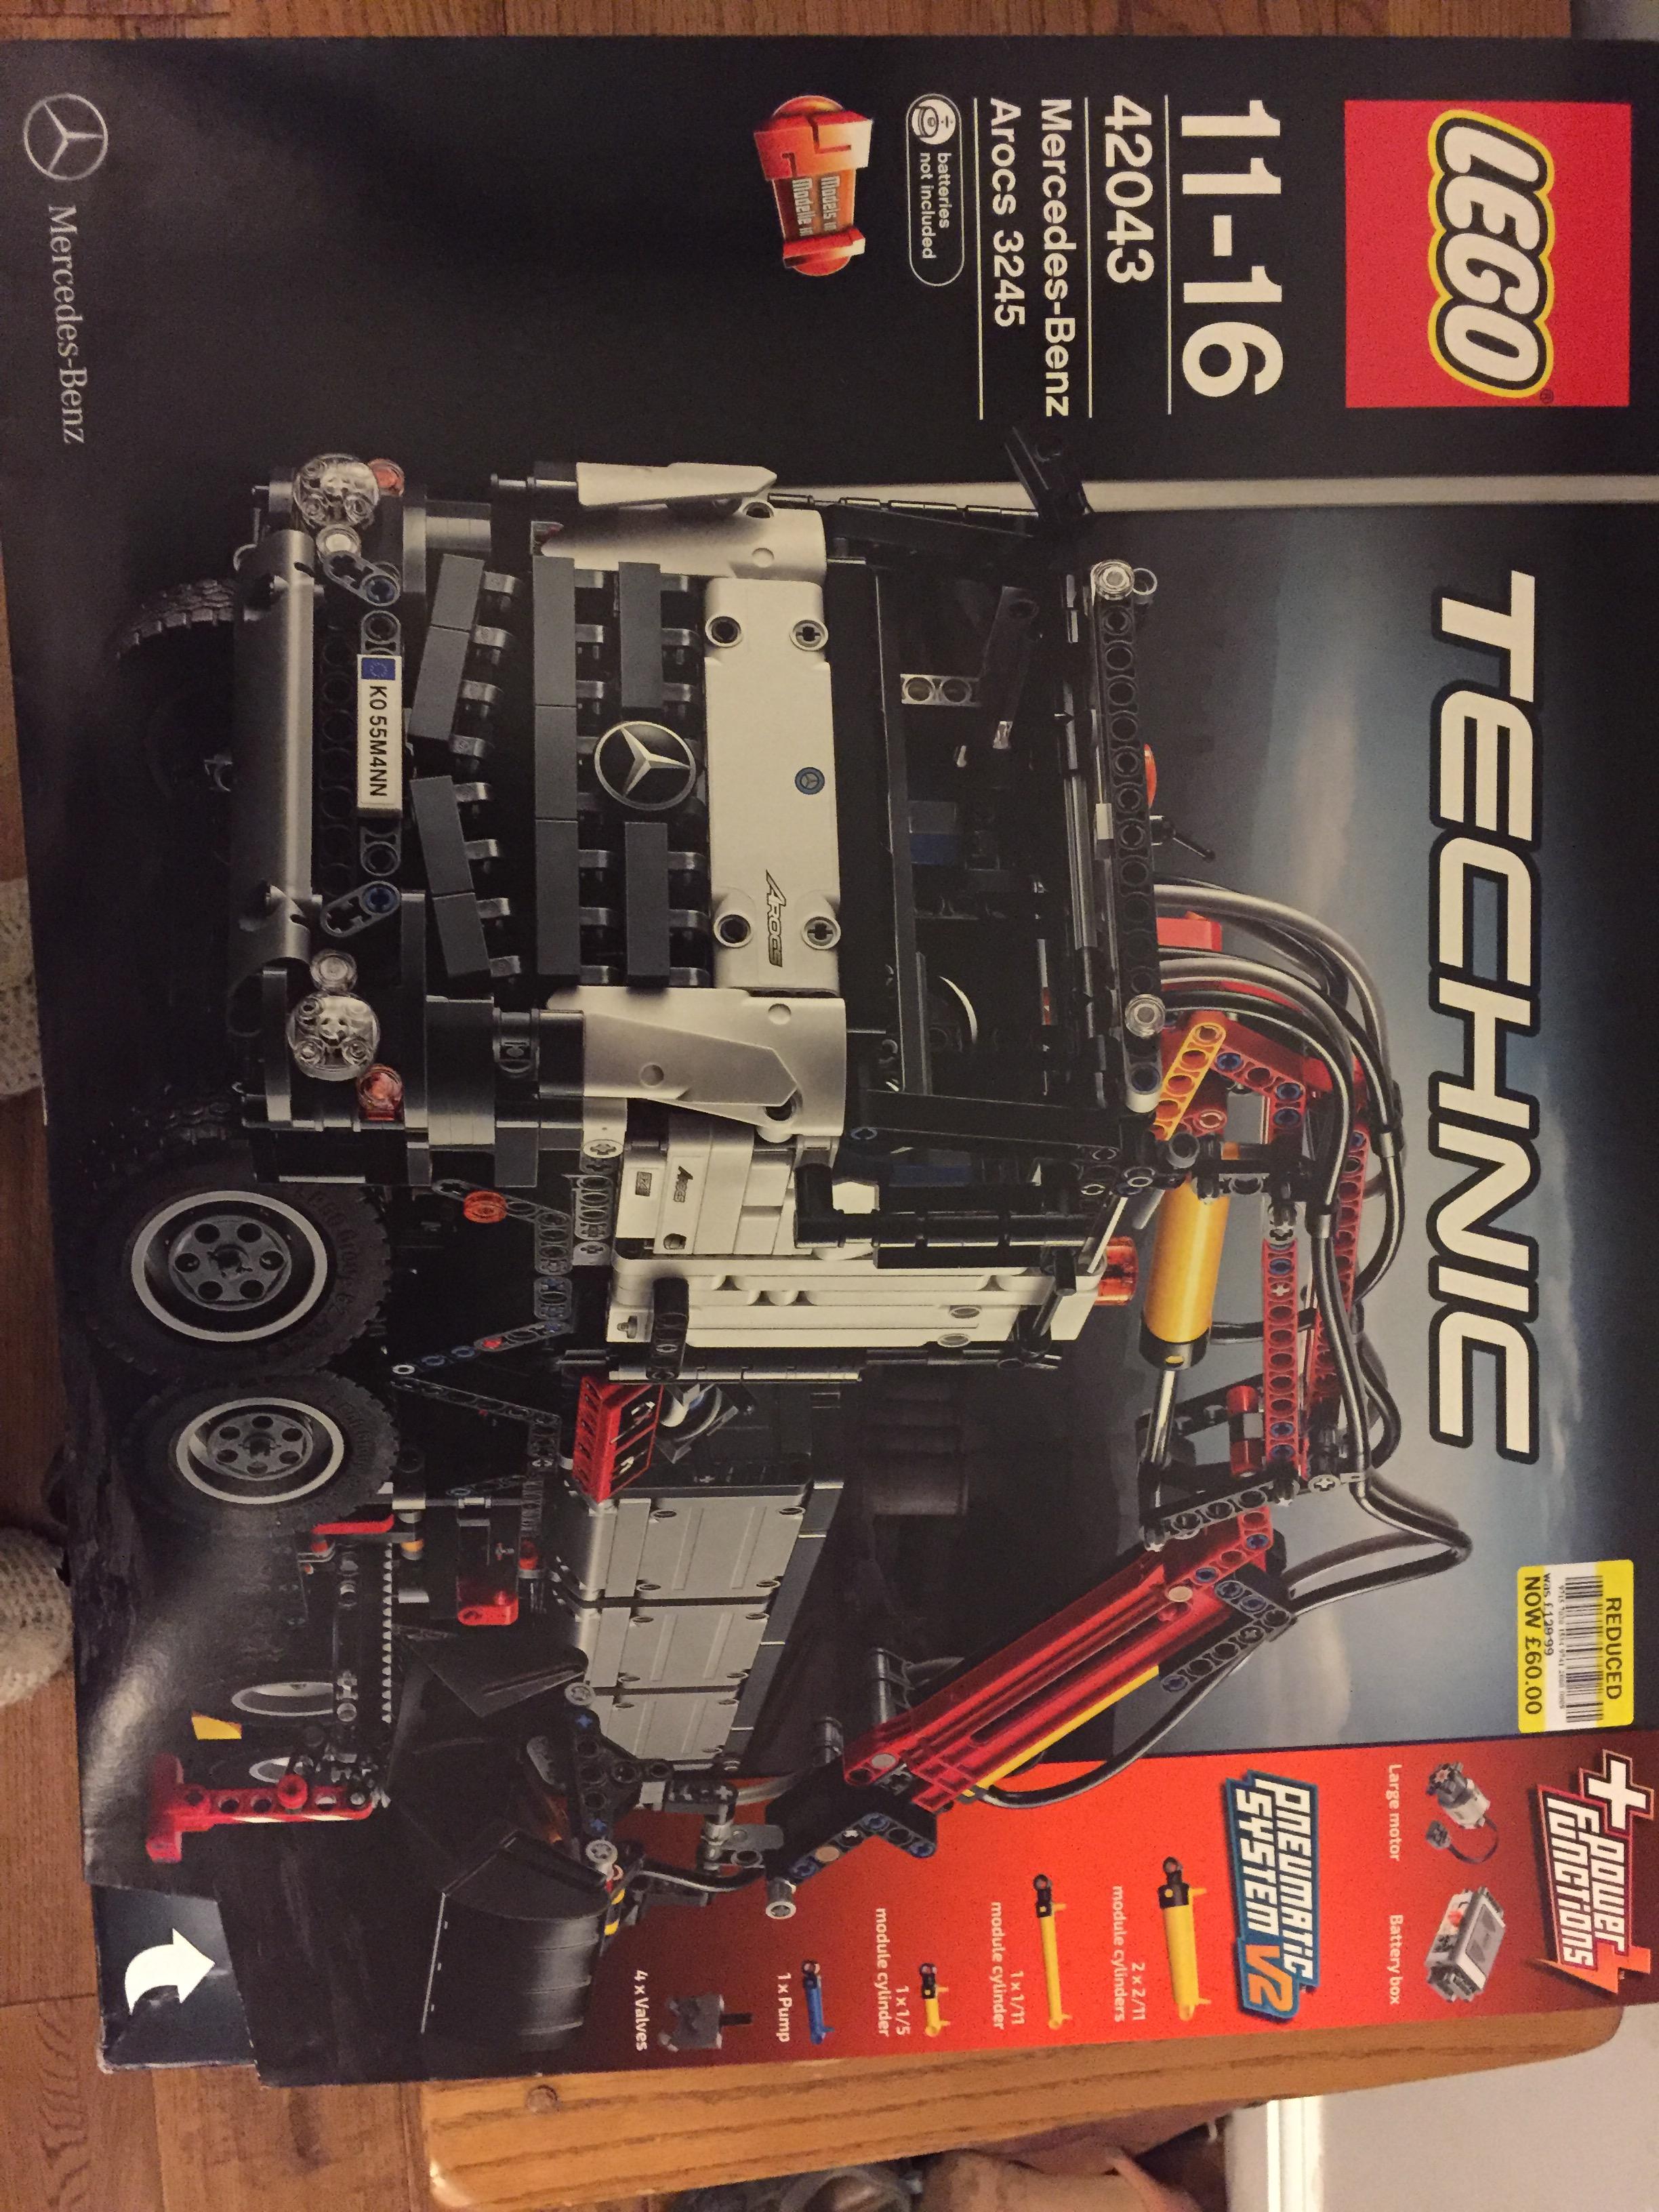 Lego Technic 42043 Mercedes Benz Arocs 3245 reduced to £60 in store Tesco (Loughborough)